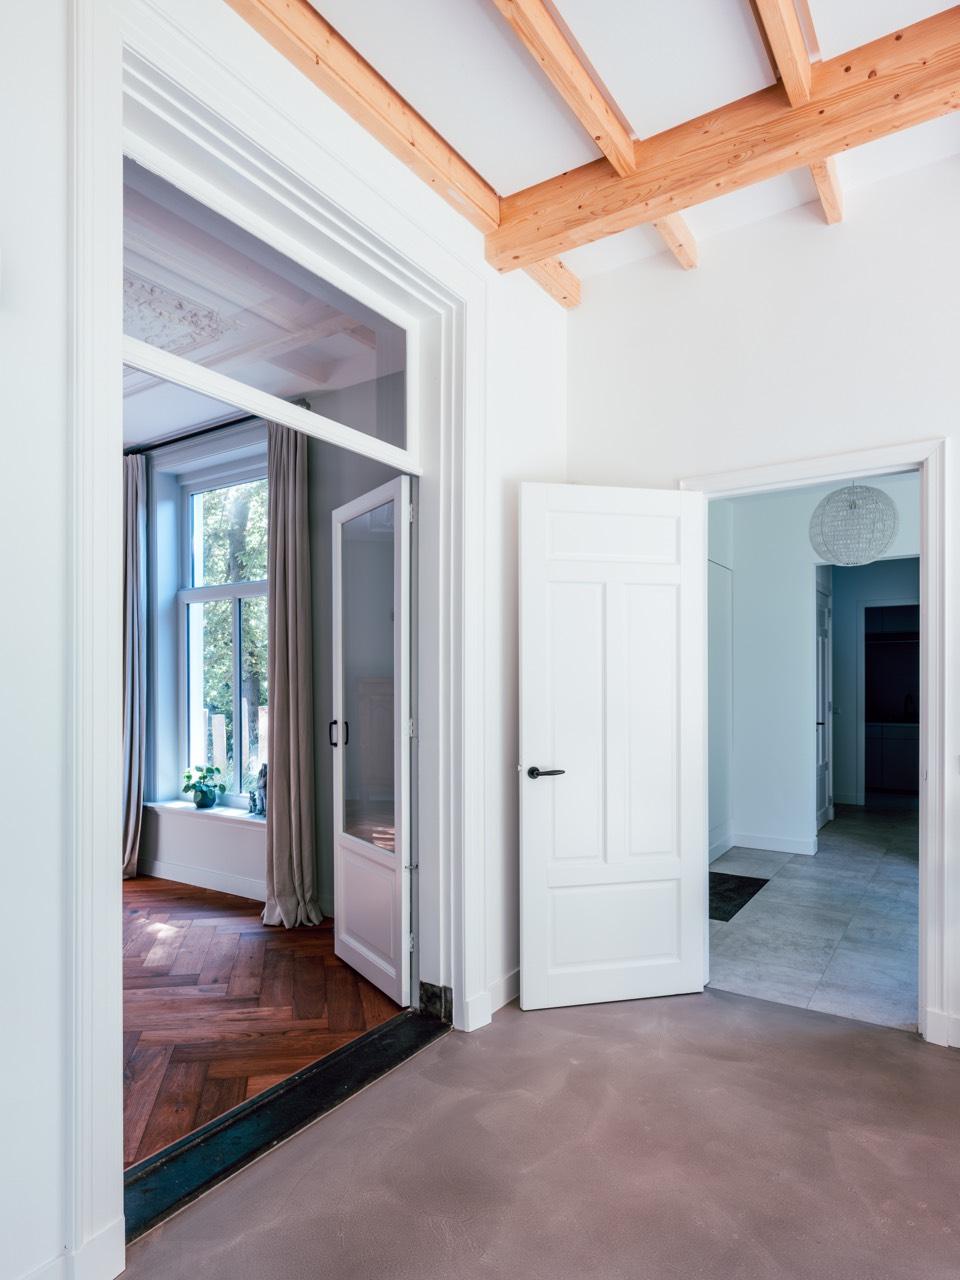 overveen-evelijn-ferwerda-interieur-design-gang